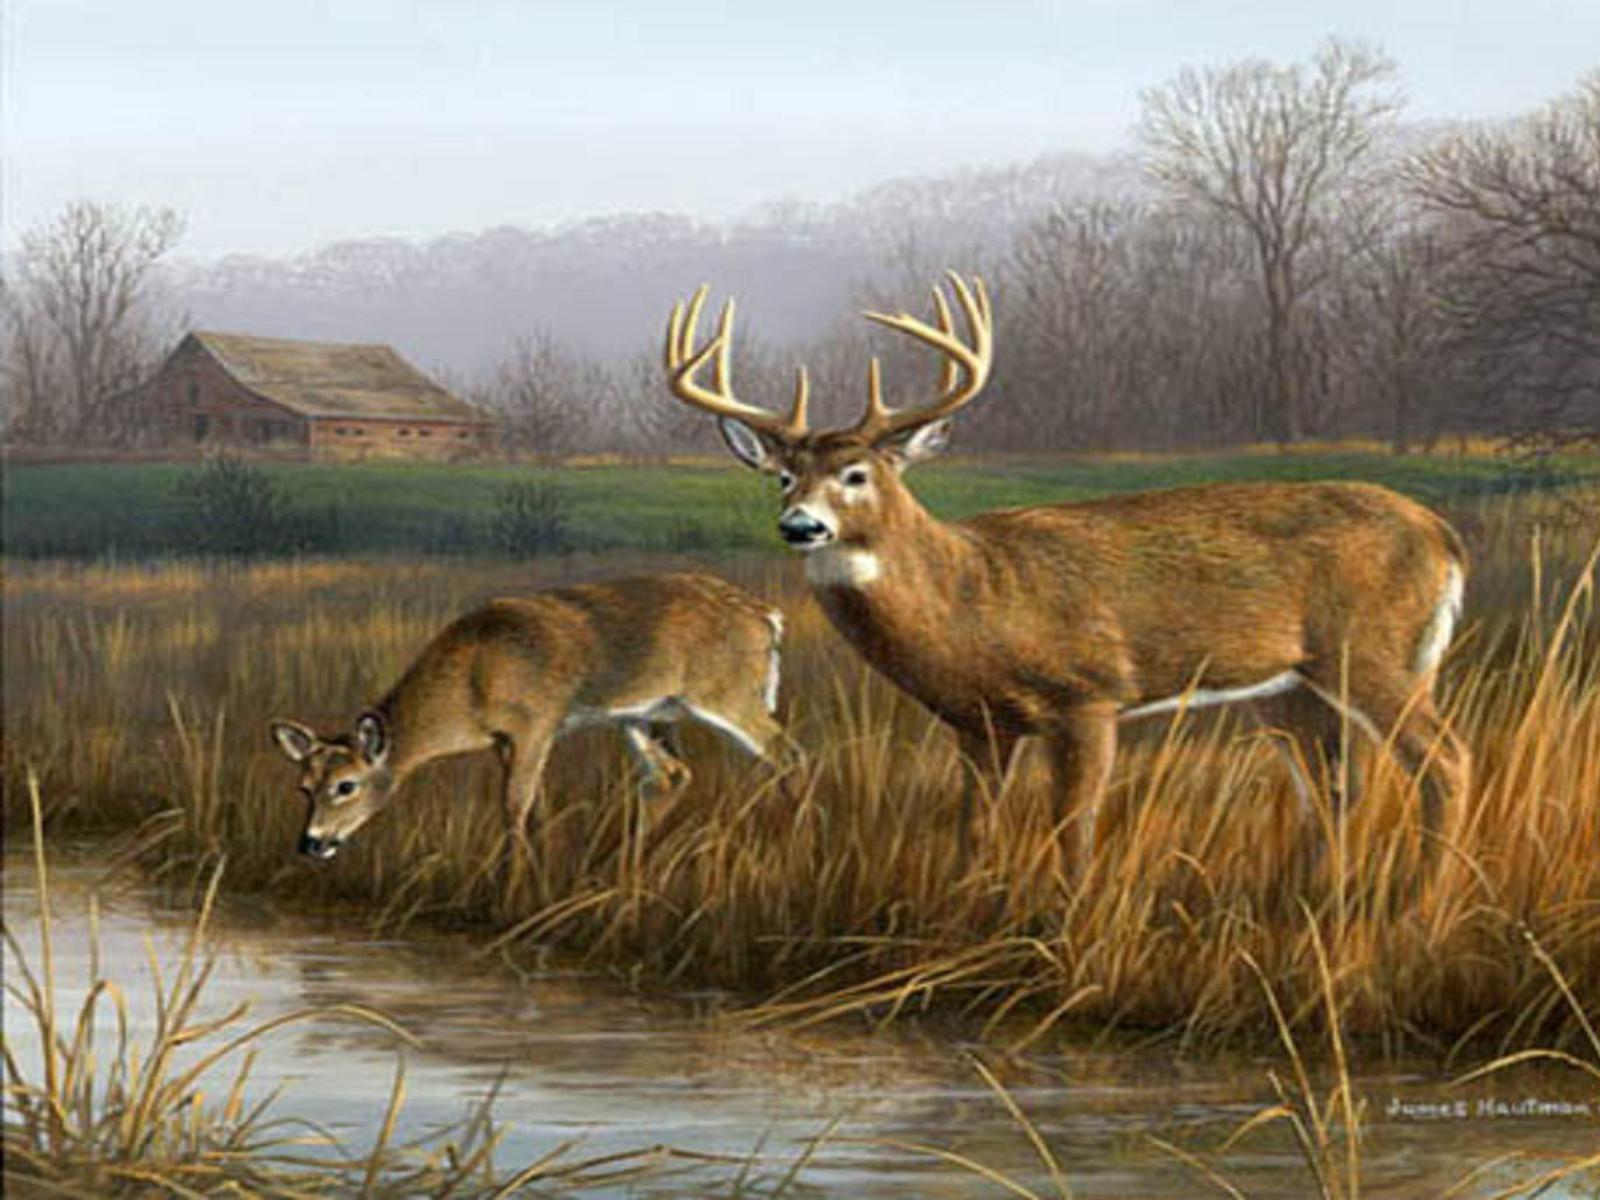 Deer HD Wallpapers HD Wallpapers Depot Pro 1600x1200